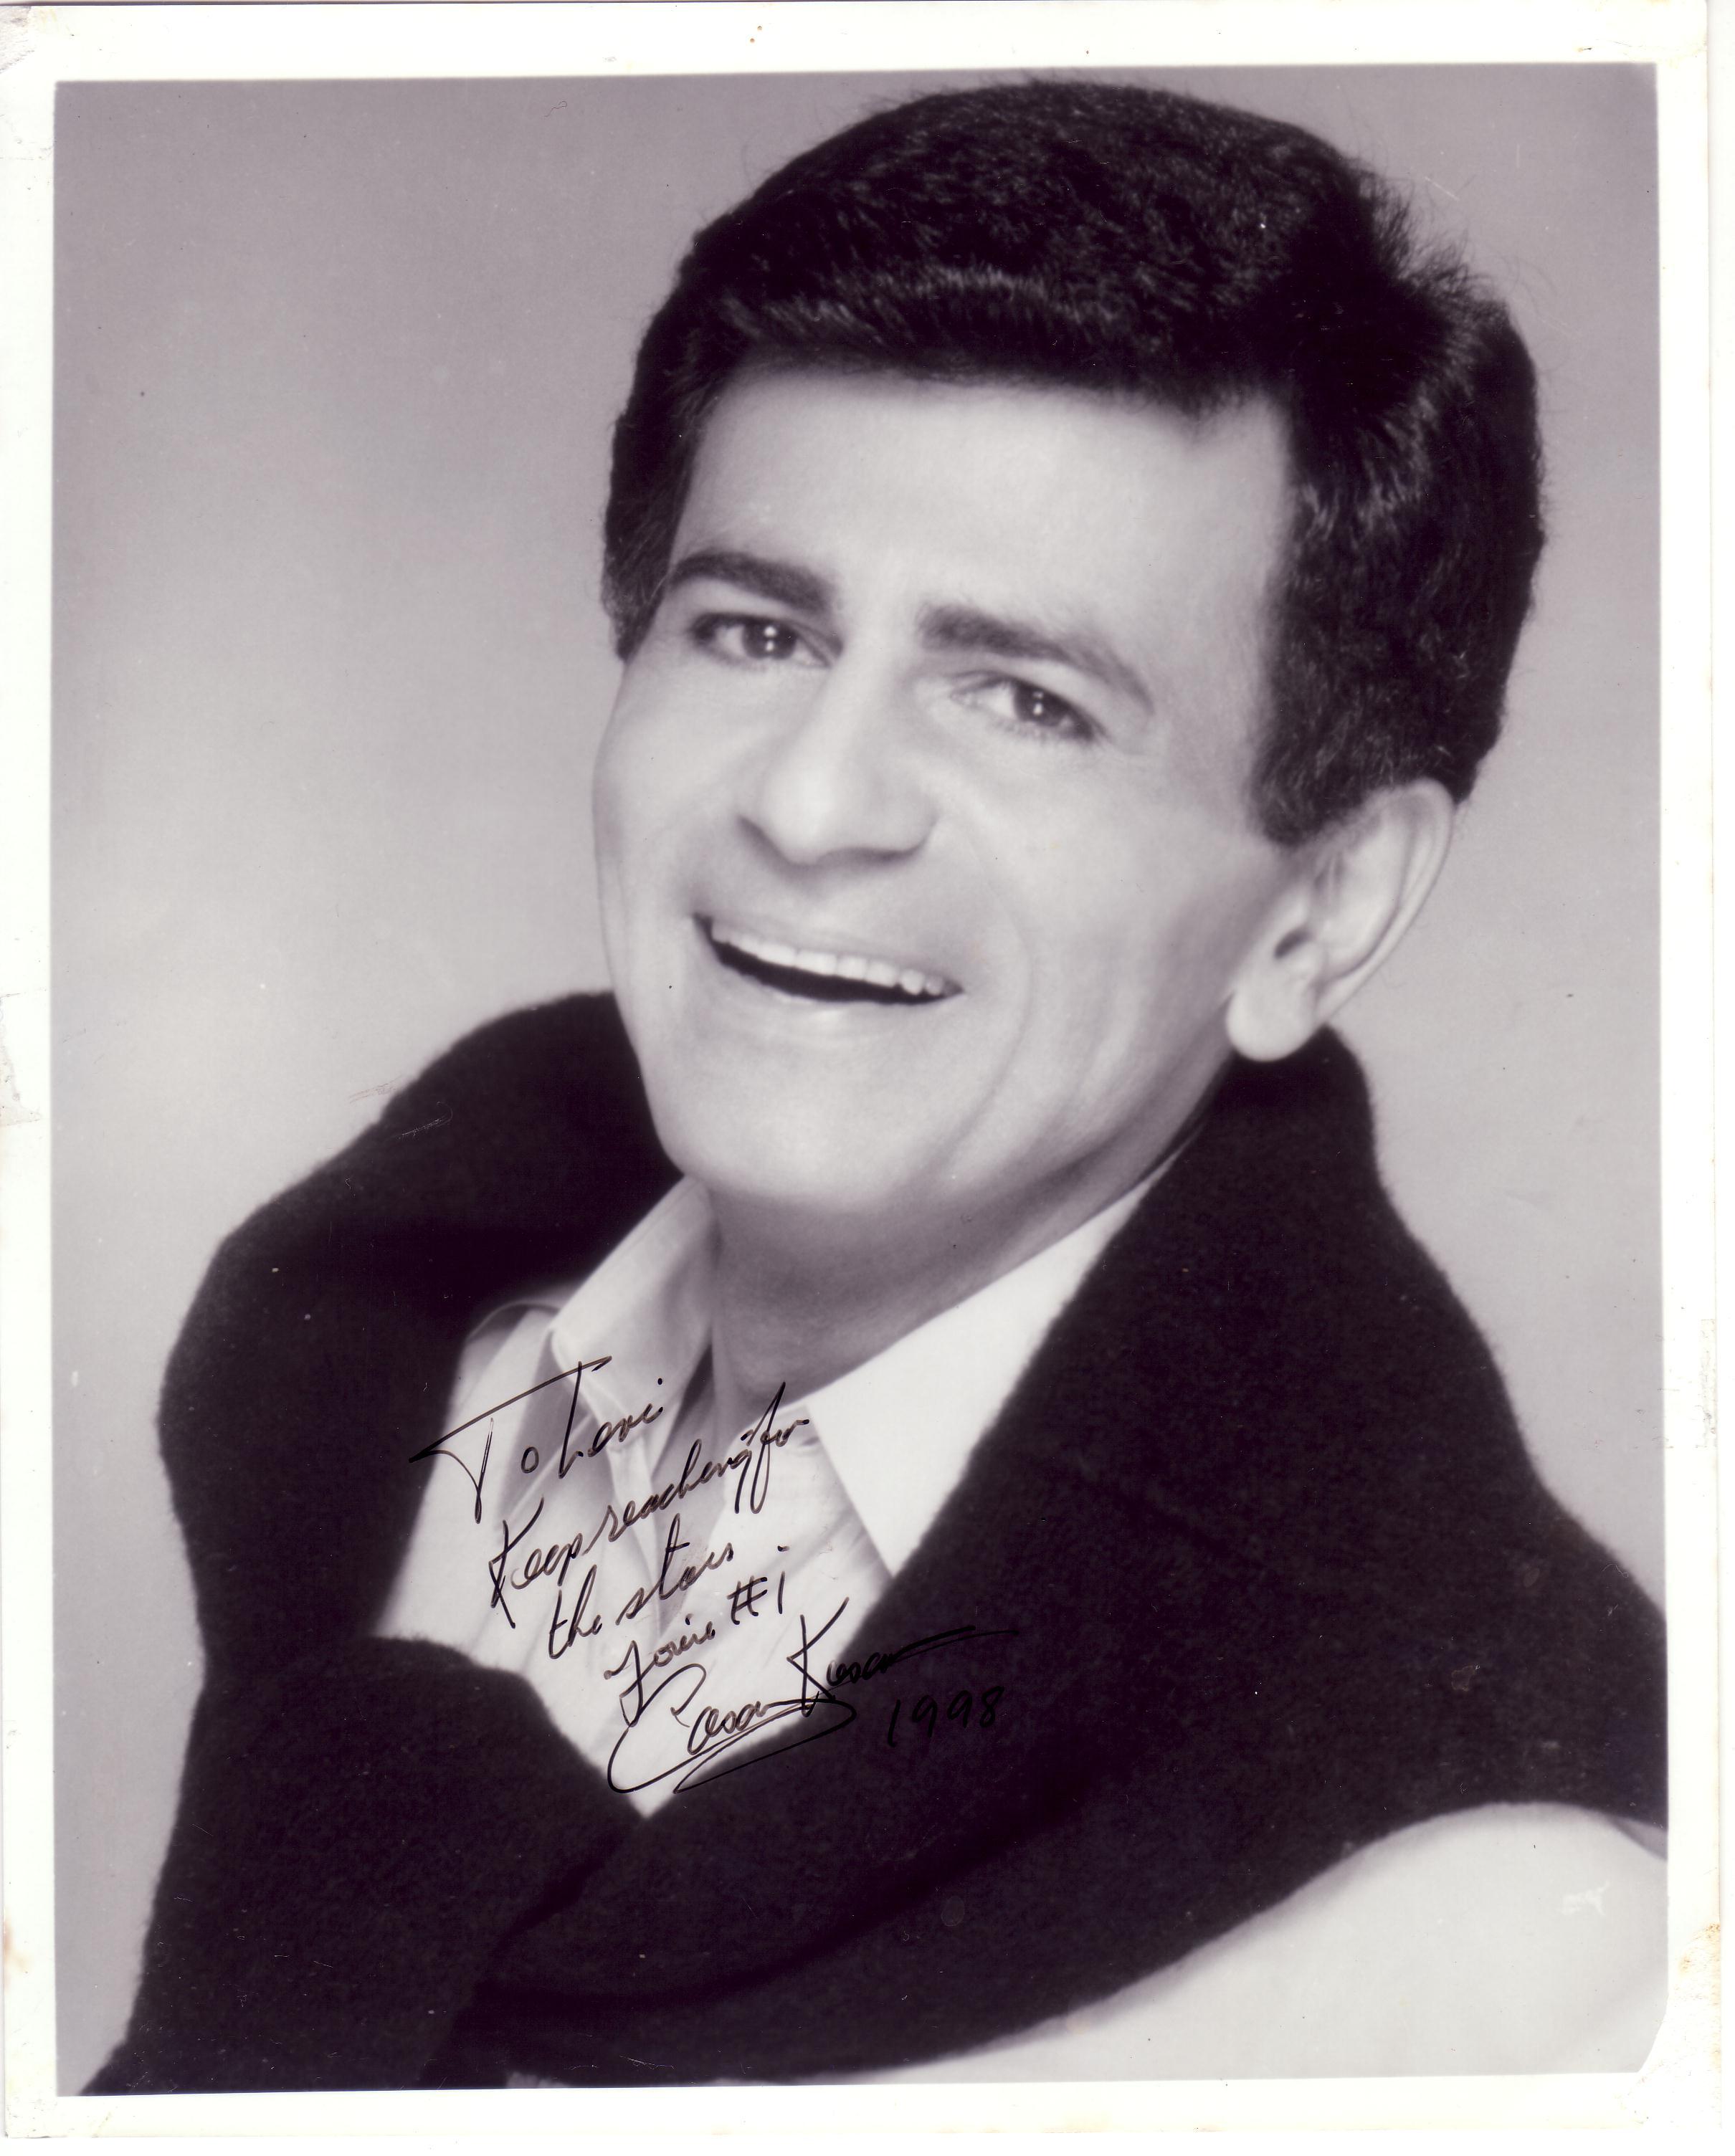 American Top 40 - Casey Kasem - 1970s, 1980s